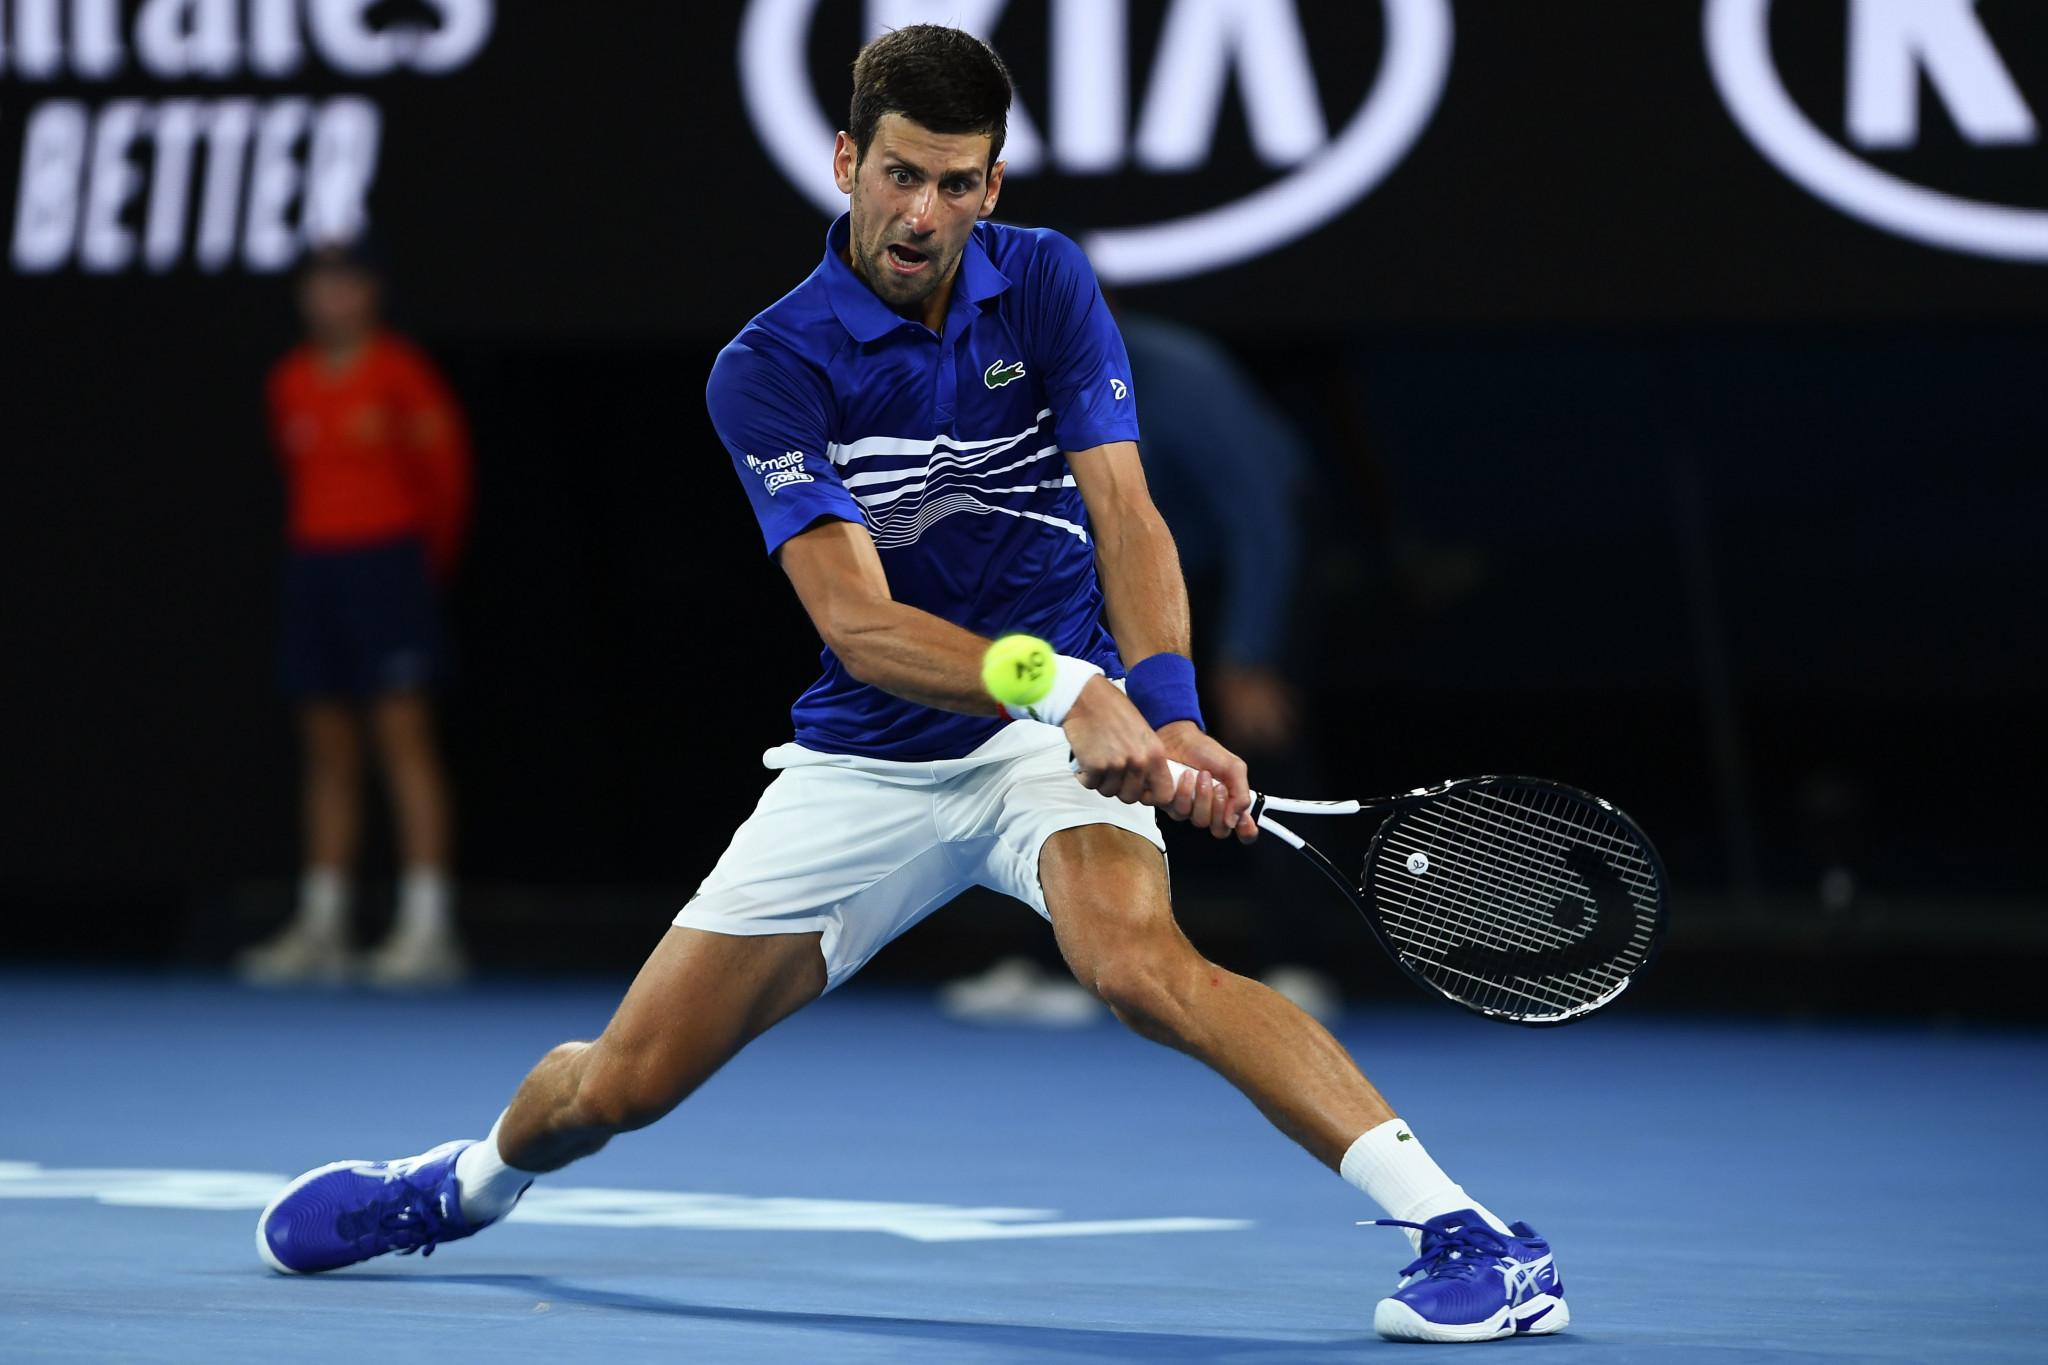 Novak Djokovic beat Daniil Medvedev in four sets in the men's singles event ©Getty Images